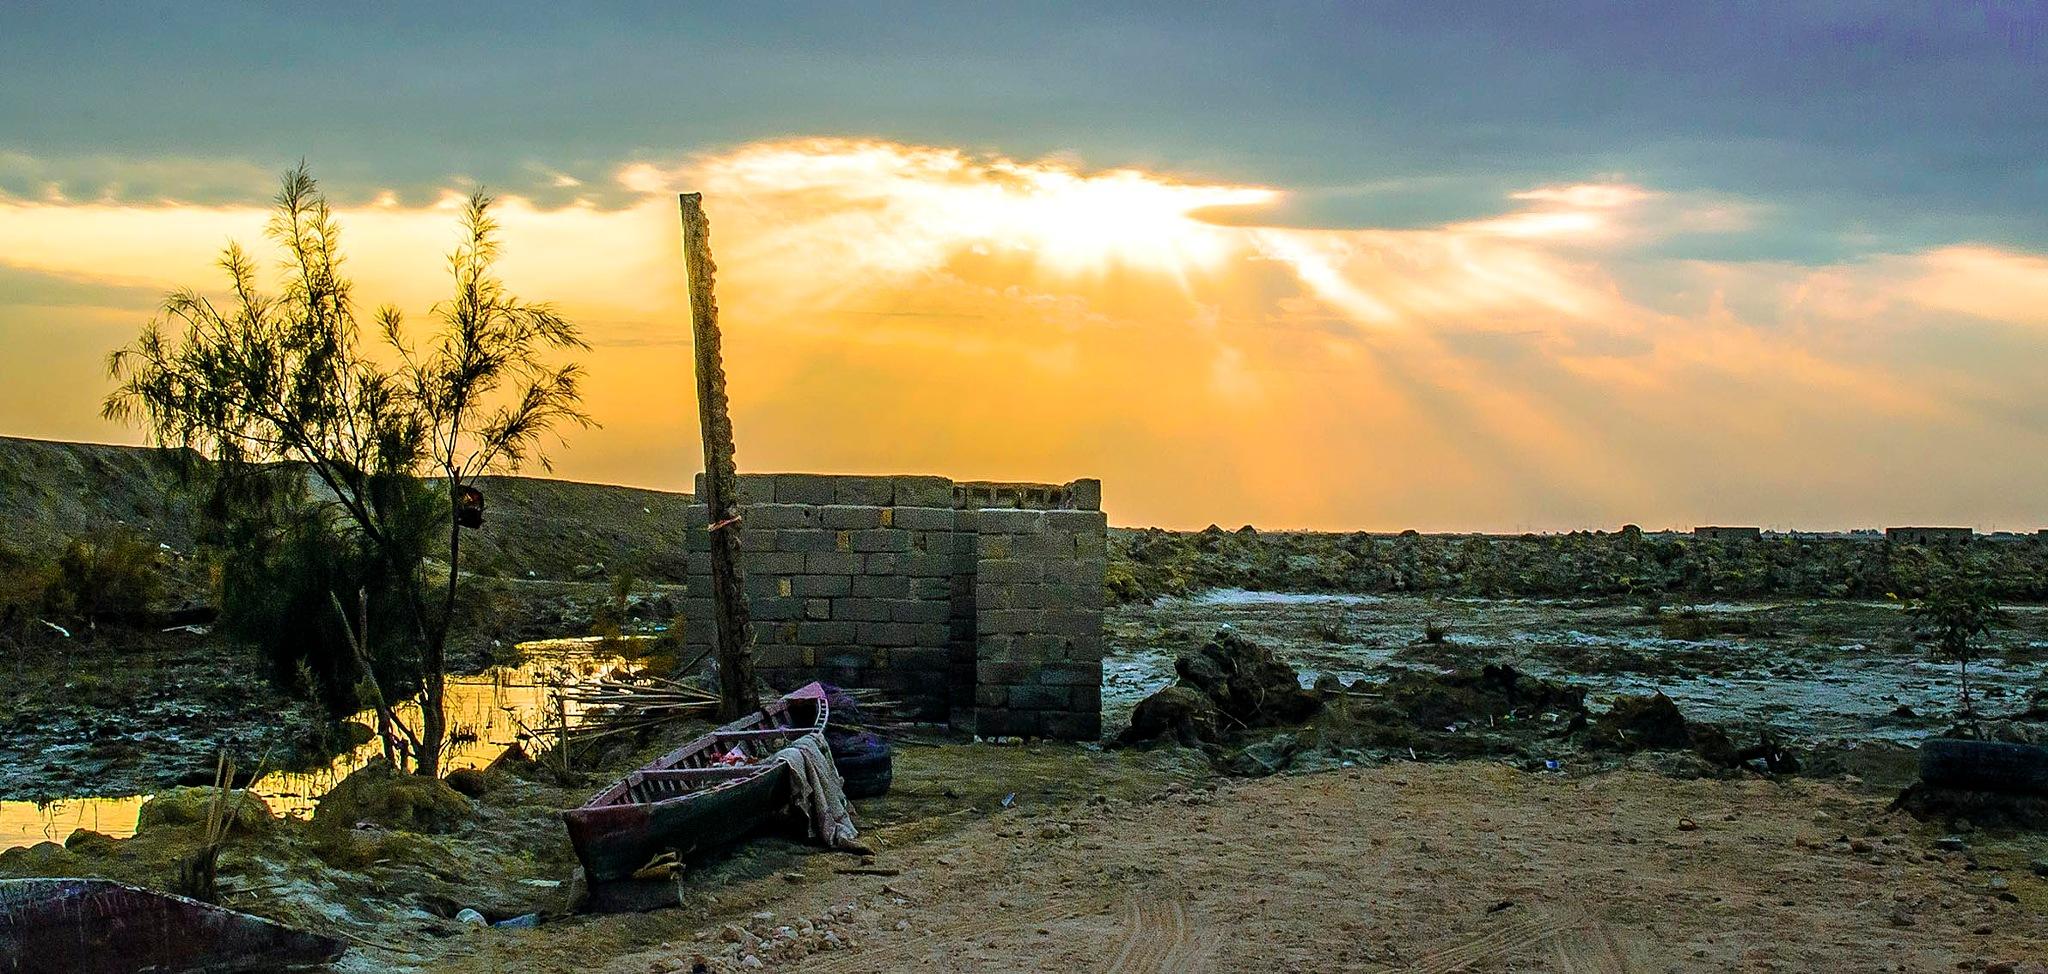 Dead river by MustafaMansour